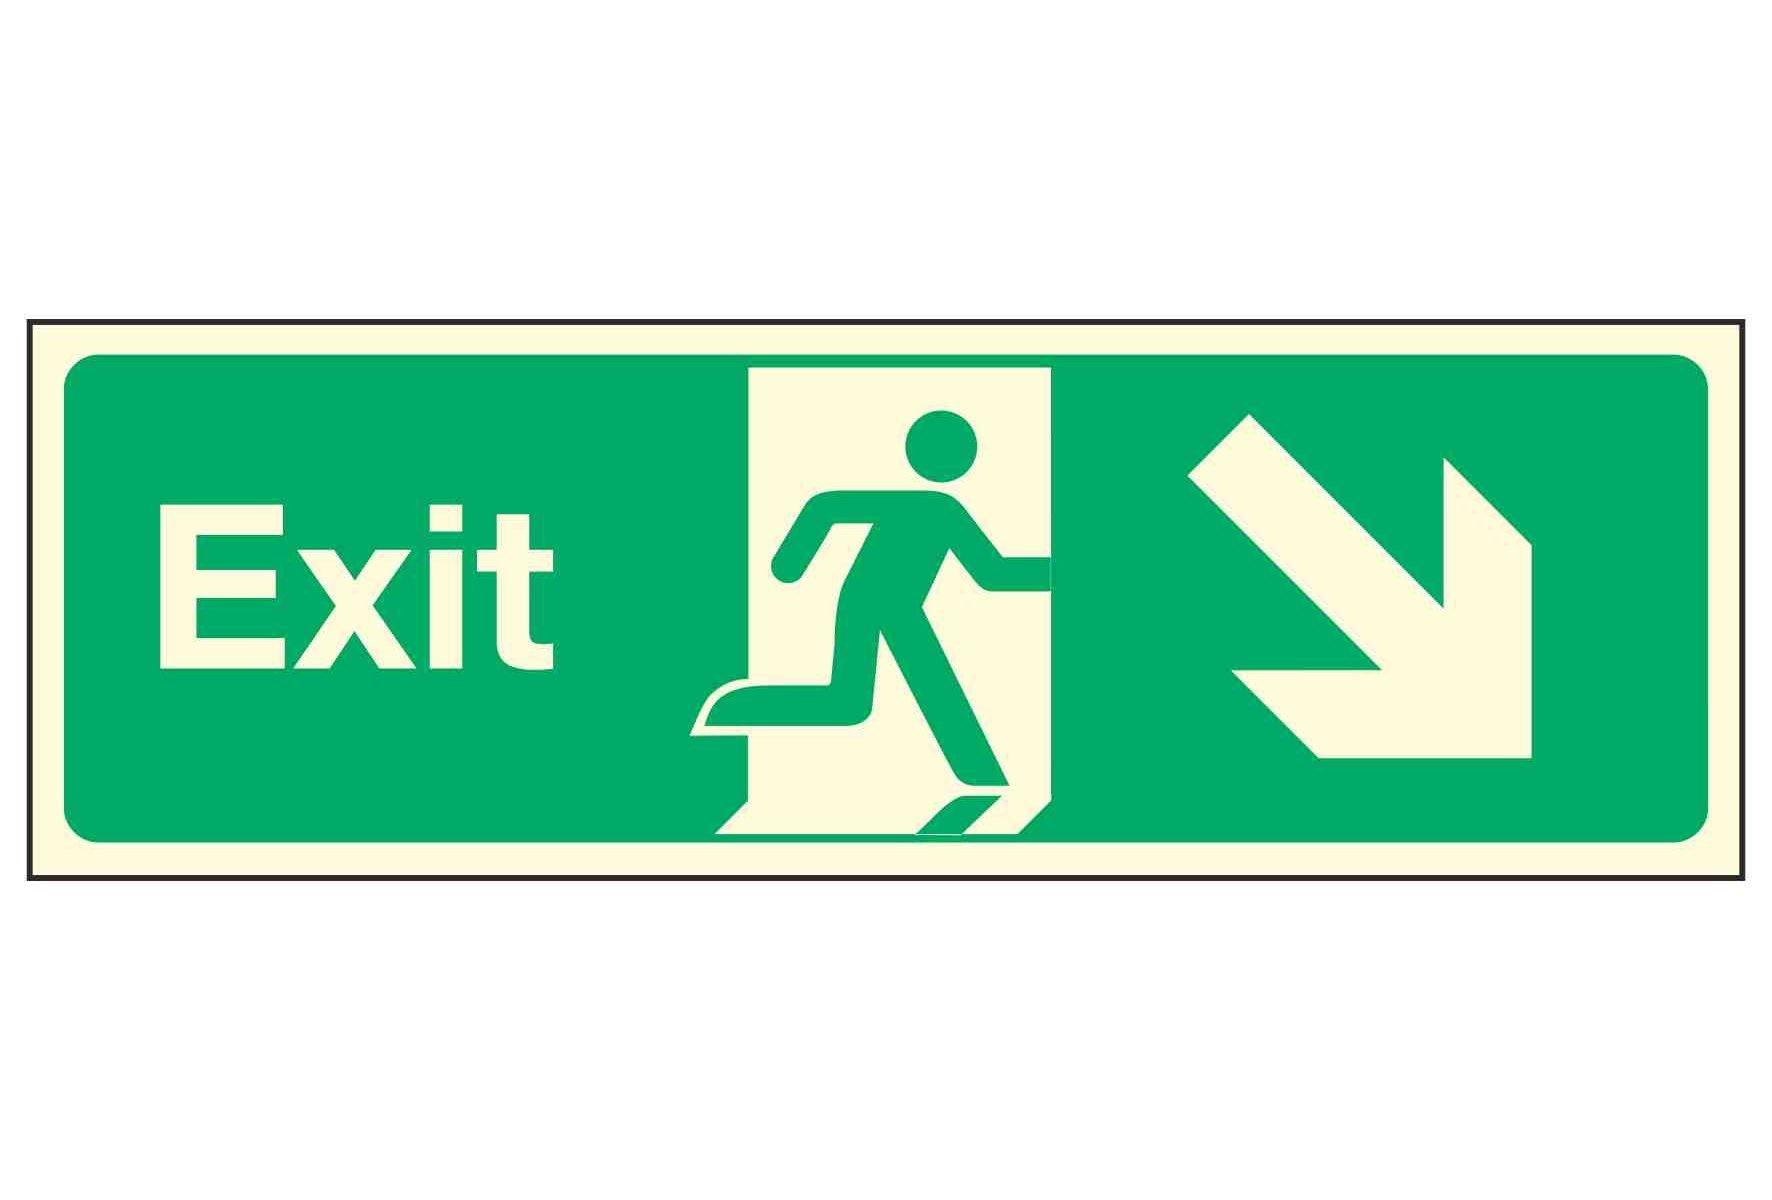 Exit / Arrow Down Right PL